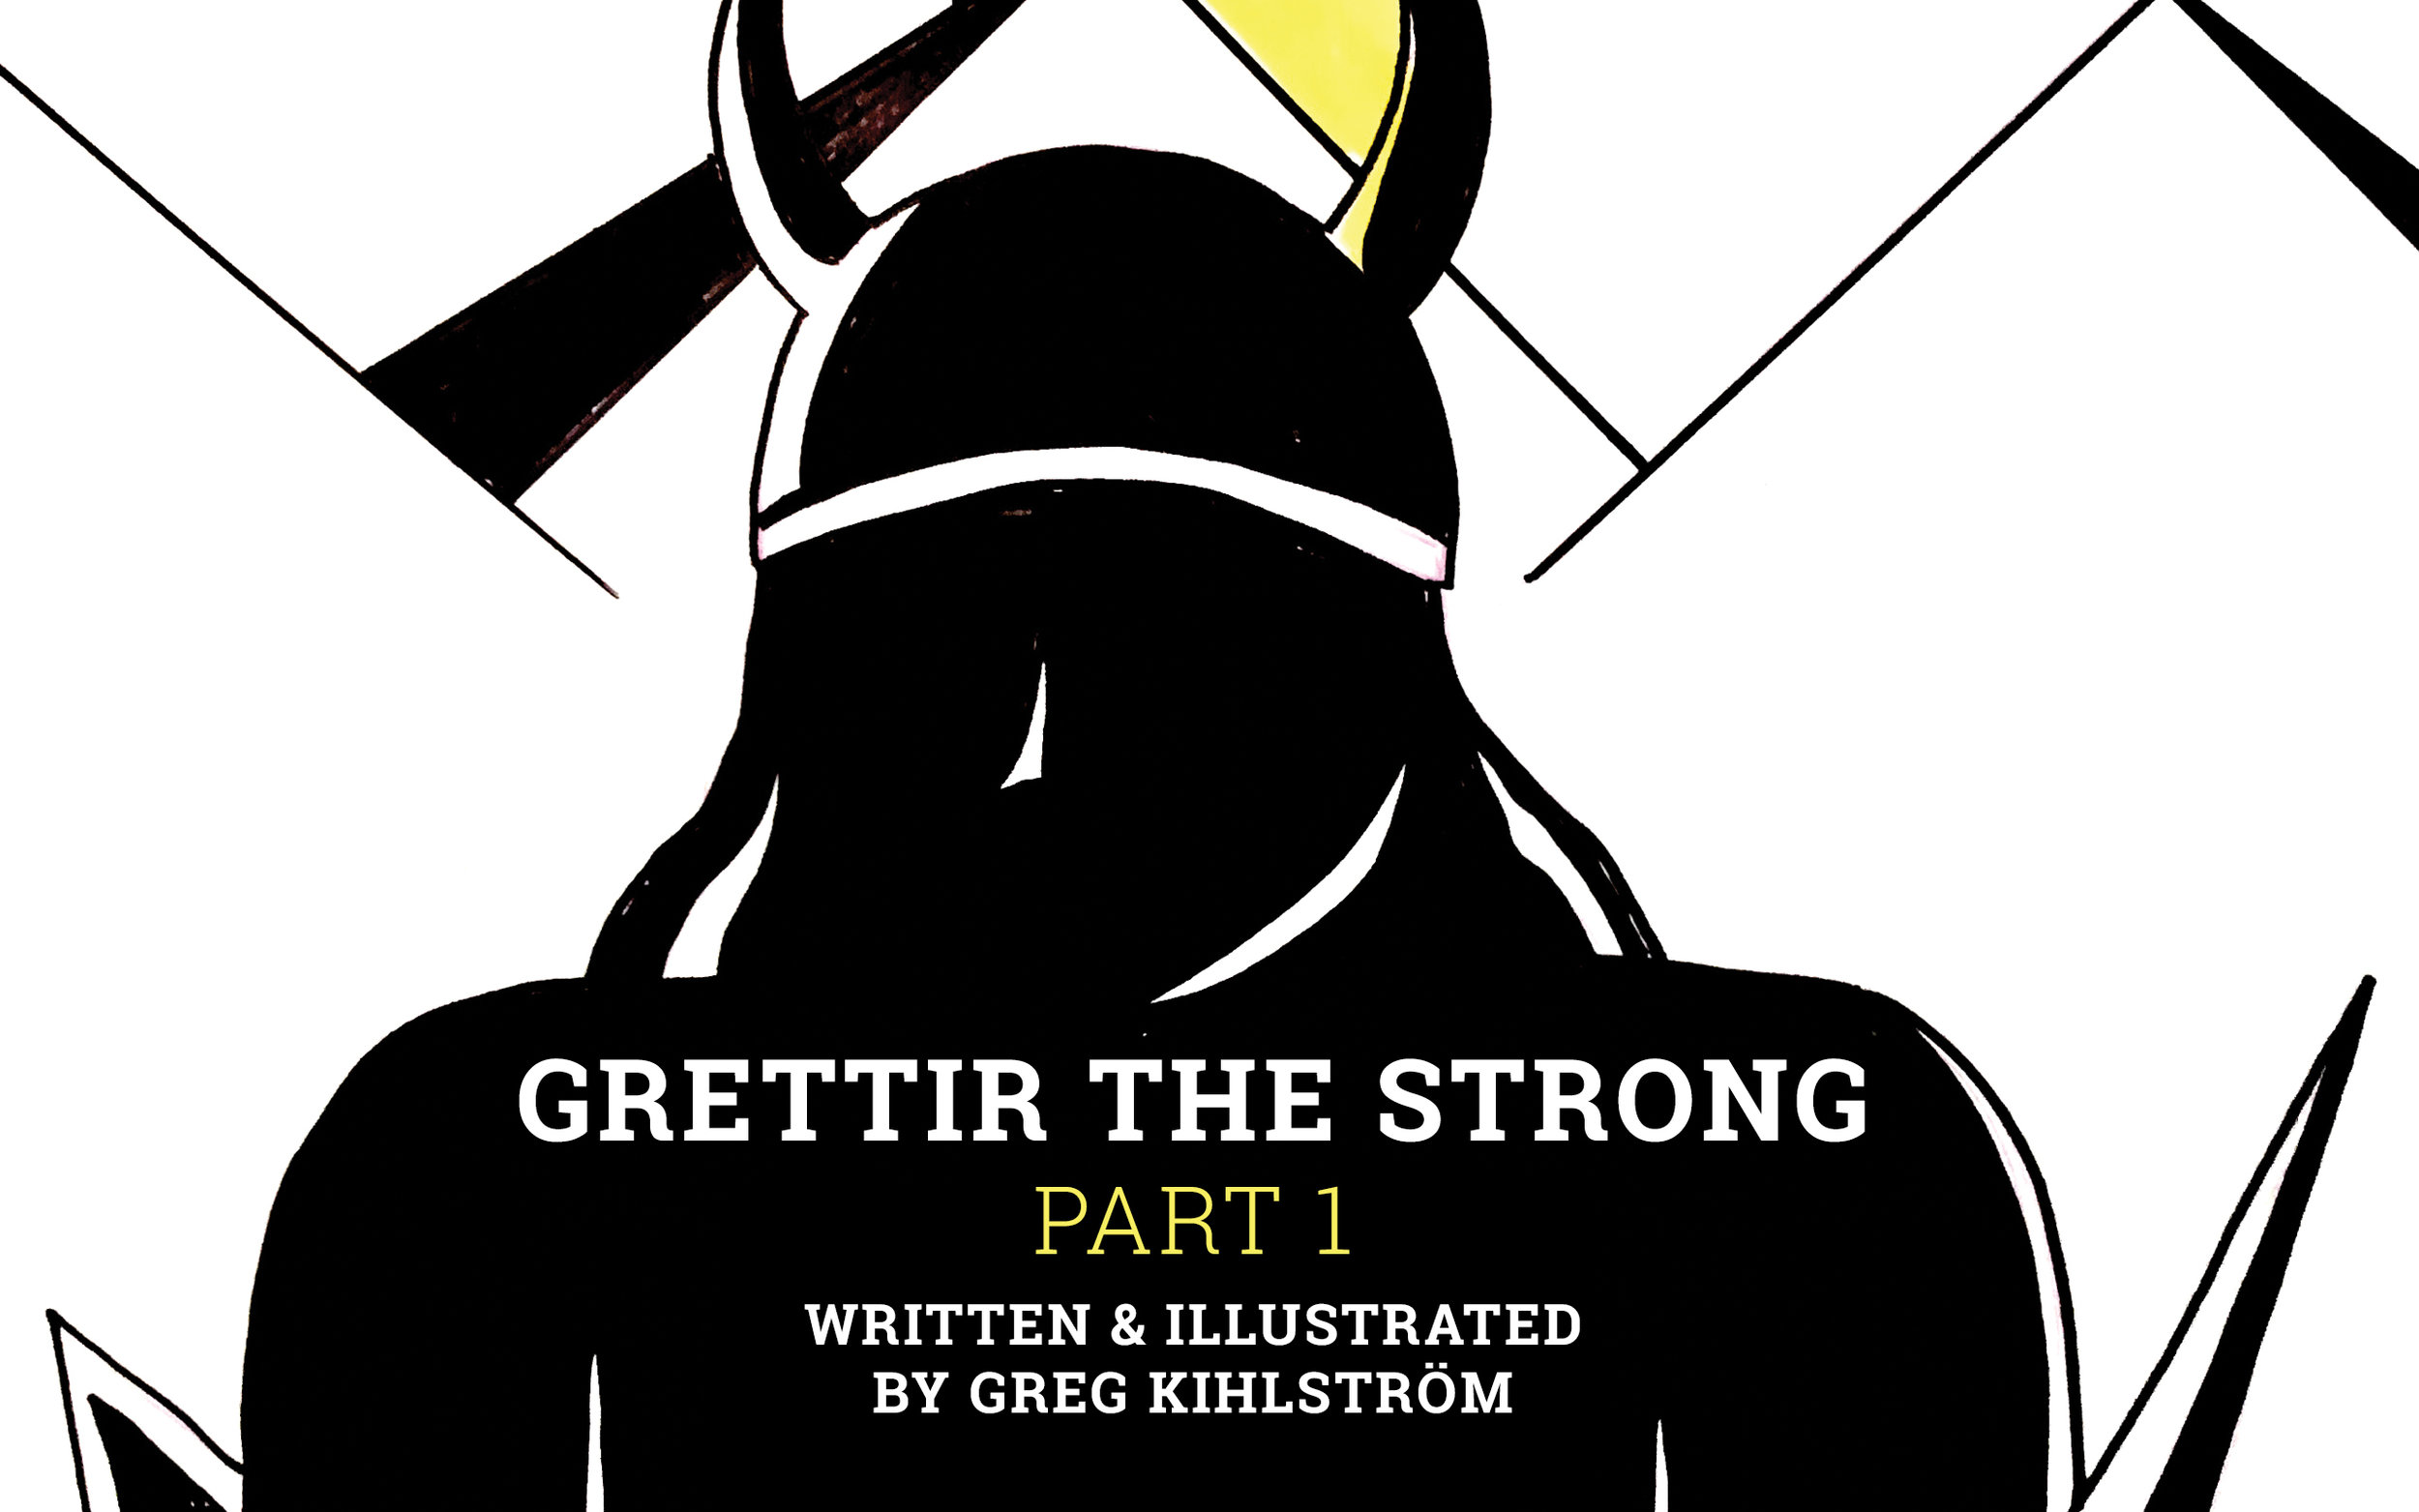 - Grettir the StrongPart 1By Greg Kihlström